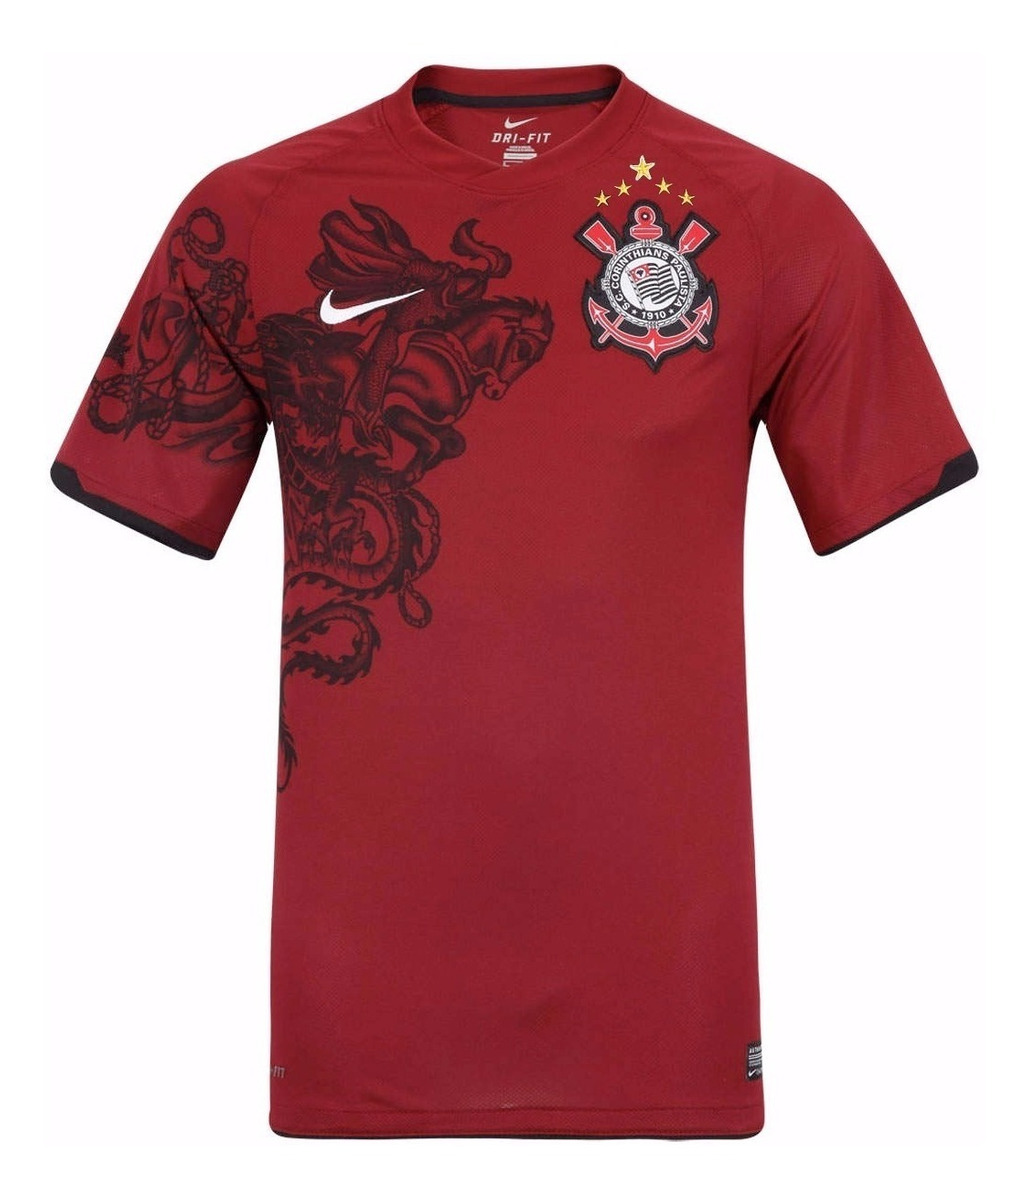 Corinthians camisa grená 2011 Nike